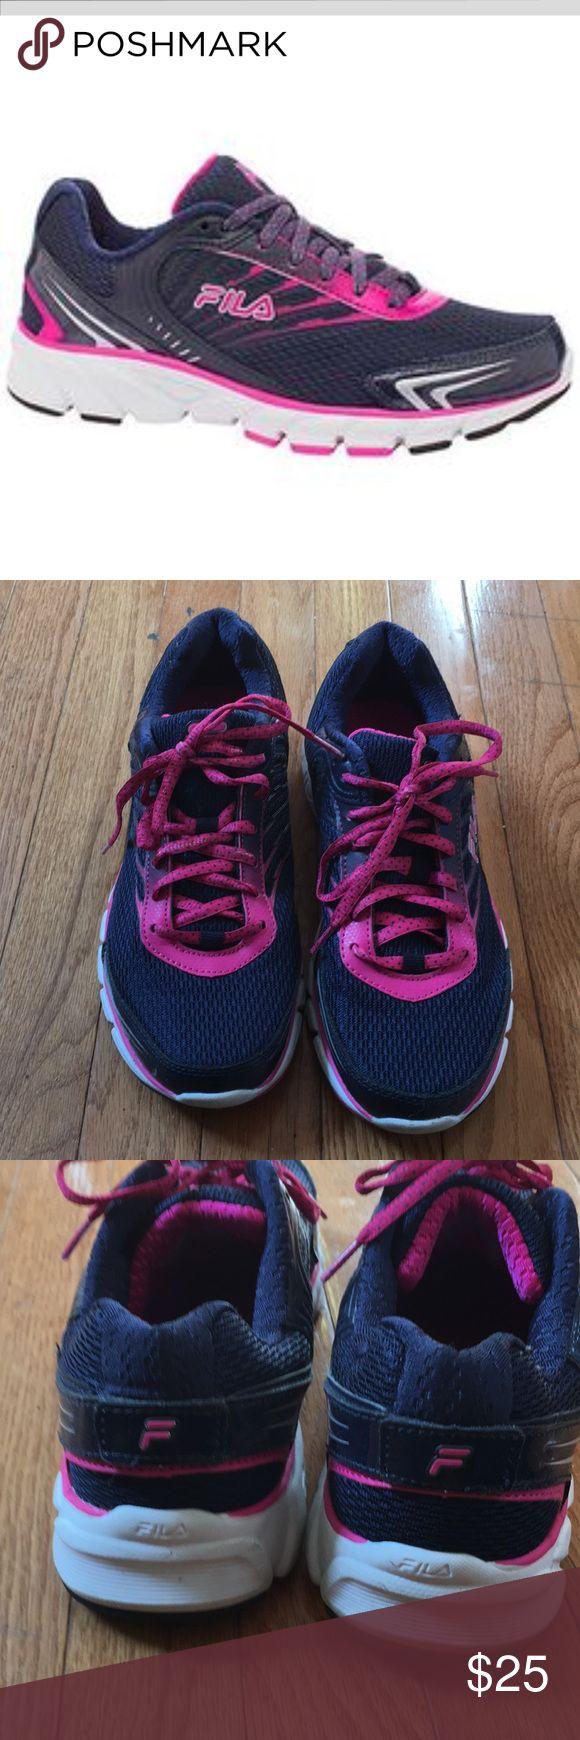 Fila running sneakers Fila women's maranello running shoe. Fila navy/pink glow/white. Comfortable sneakers worn only a few times. Great fit. Fila Shoes Sneakers